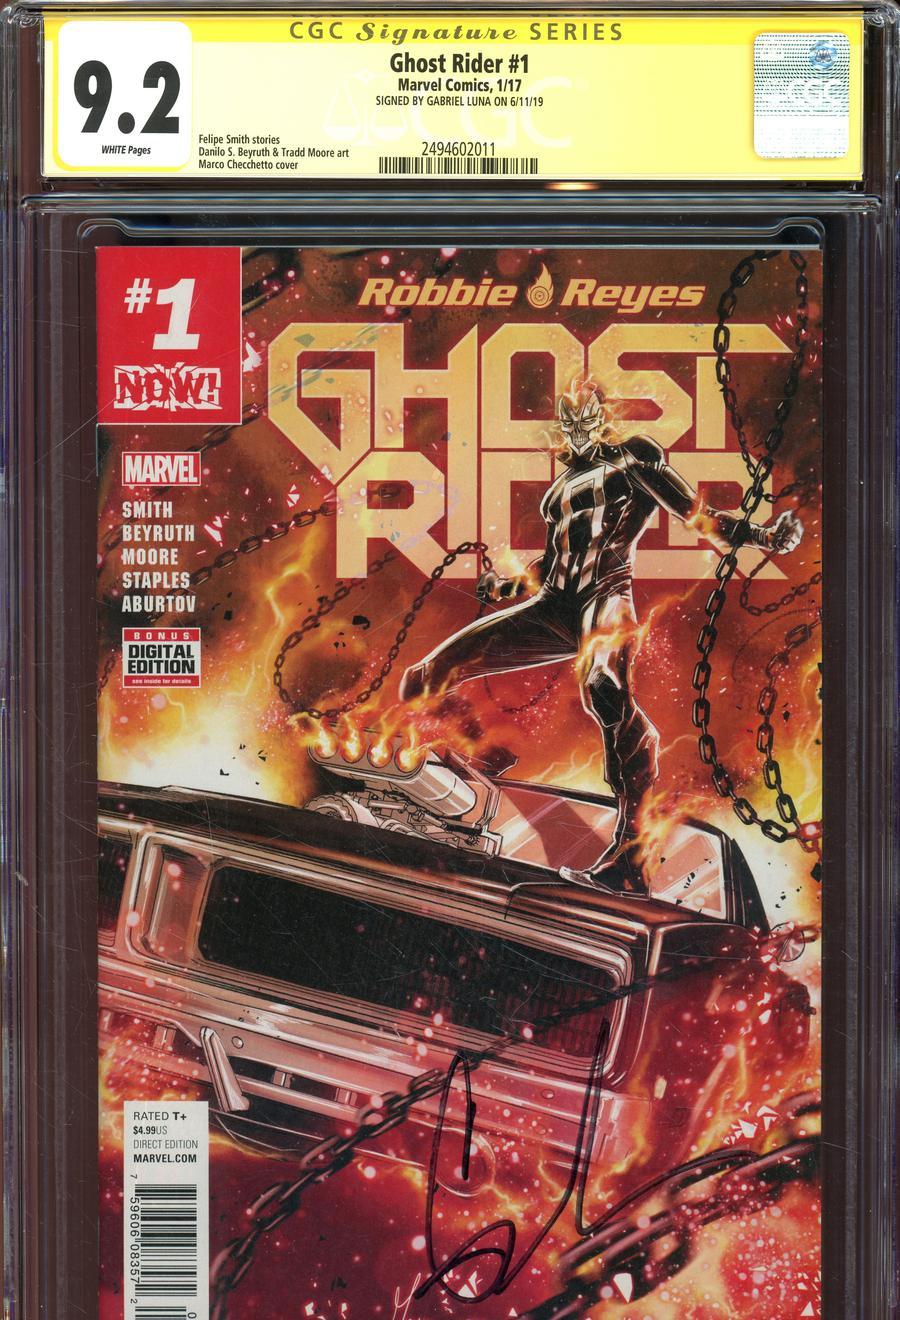 Ghost Rider Vol 7 #1 Cover K Regular Marco Checchetto Cover Signed By Gabrielle Luna CGC 9.2